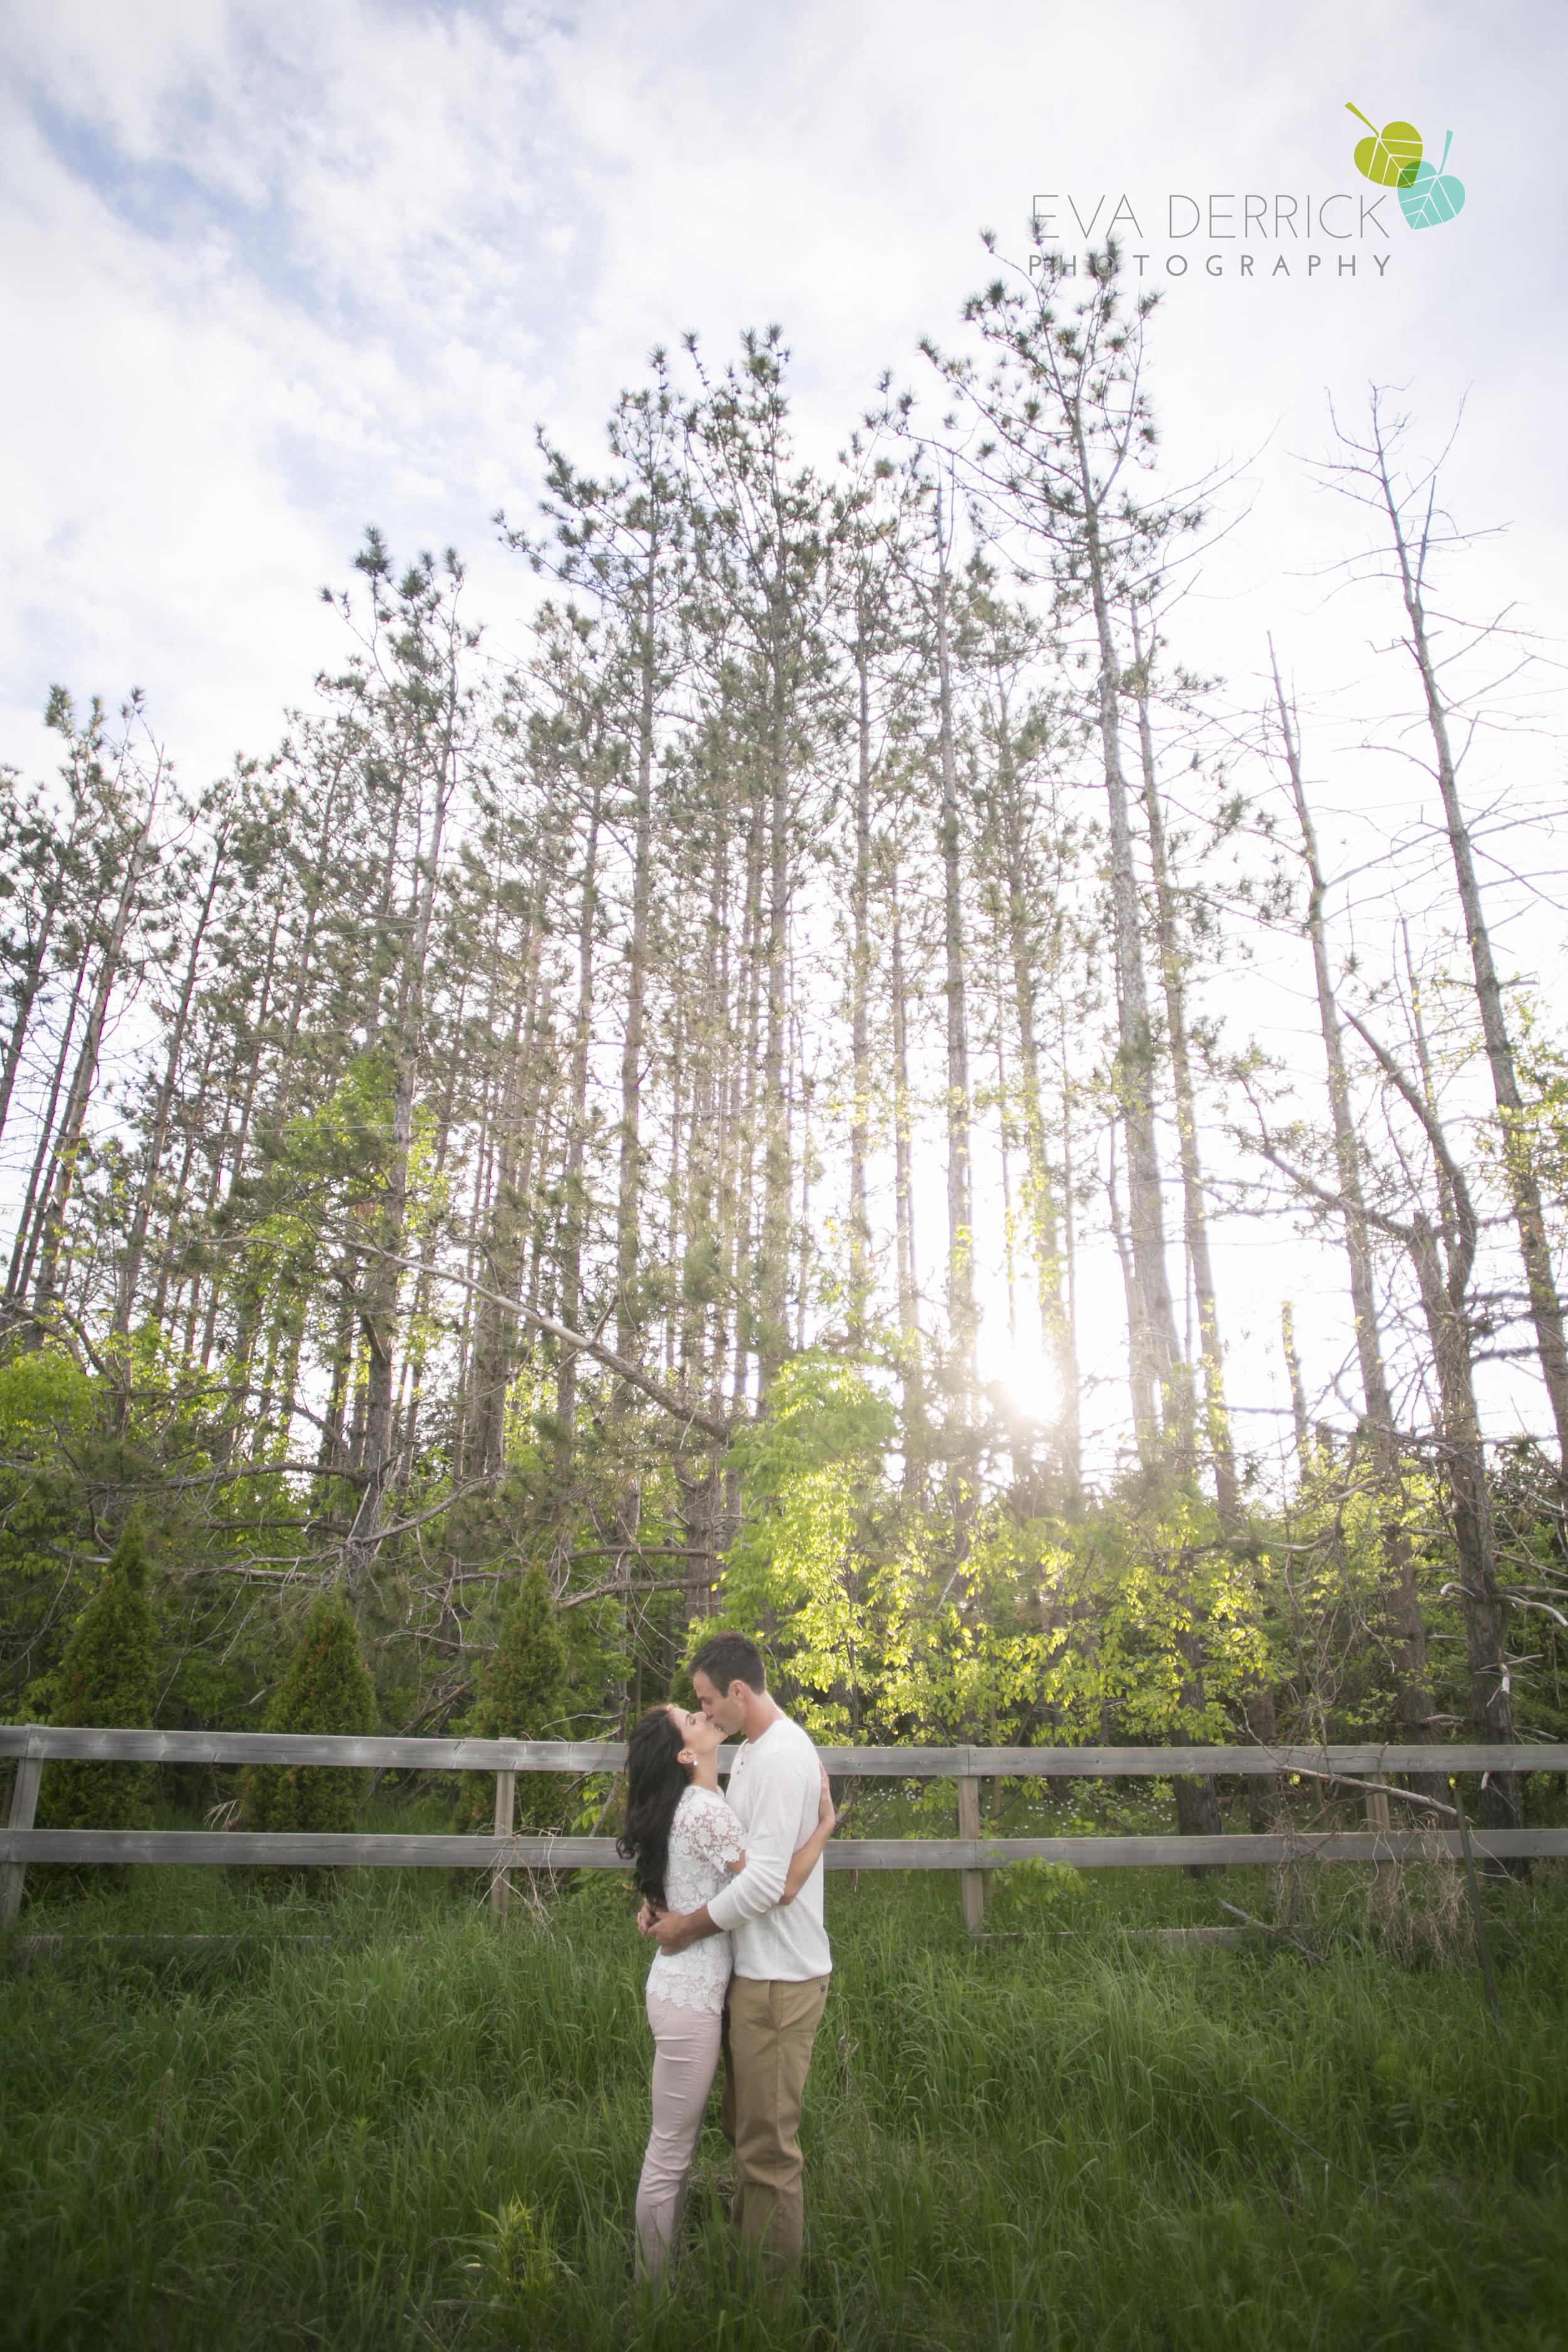 niagara-wedding-photographers-niagara-engagement-photographers-kyle-chipchura-nhl-wedding-photograher-oohlala-designs-niagara-florist.jpg